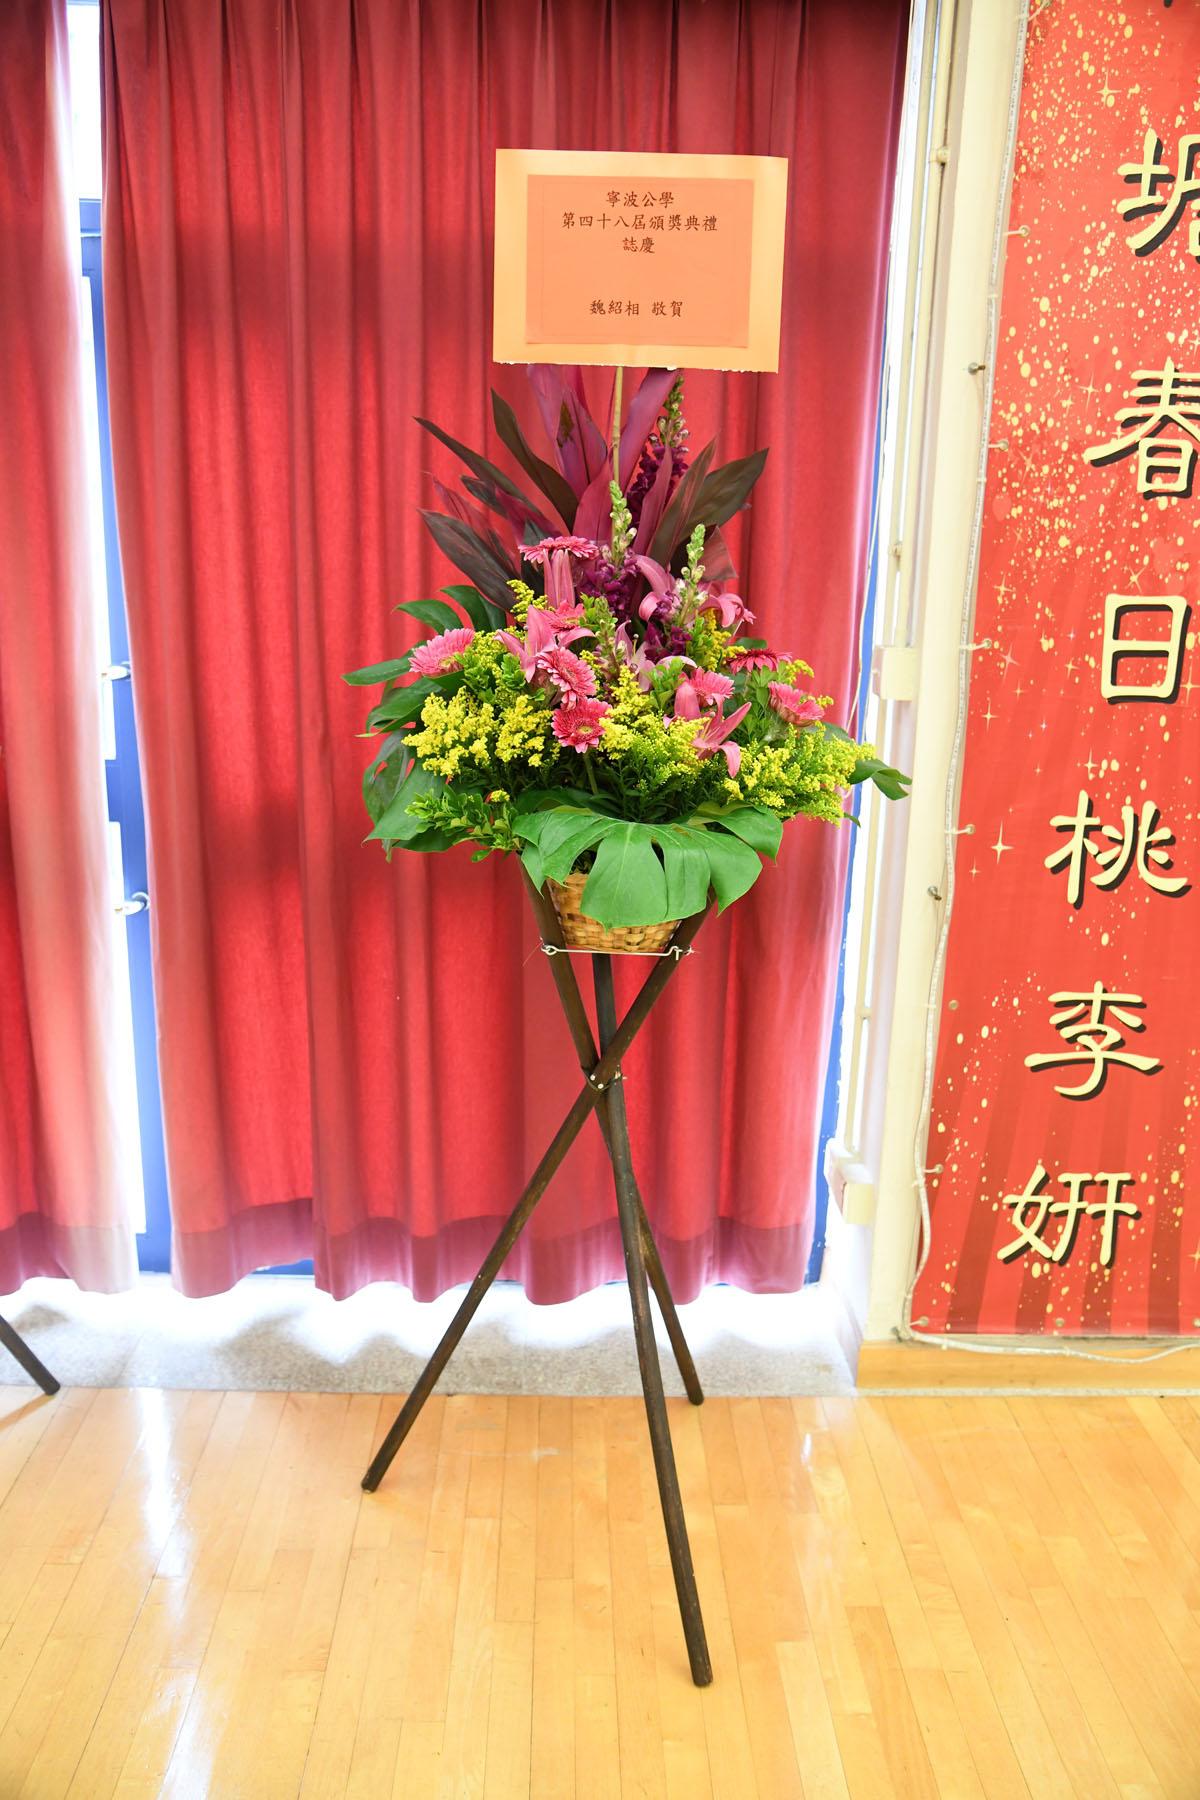 https://npc.edu.hk/sites/default/files/dsc_0254_1.jpg